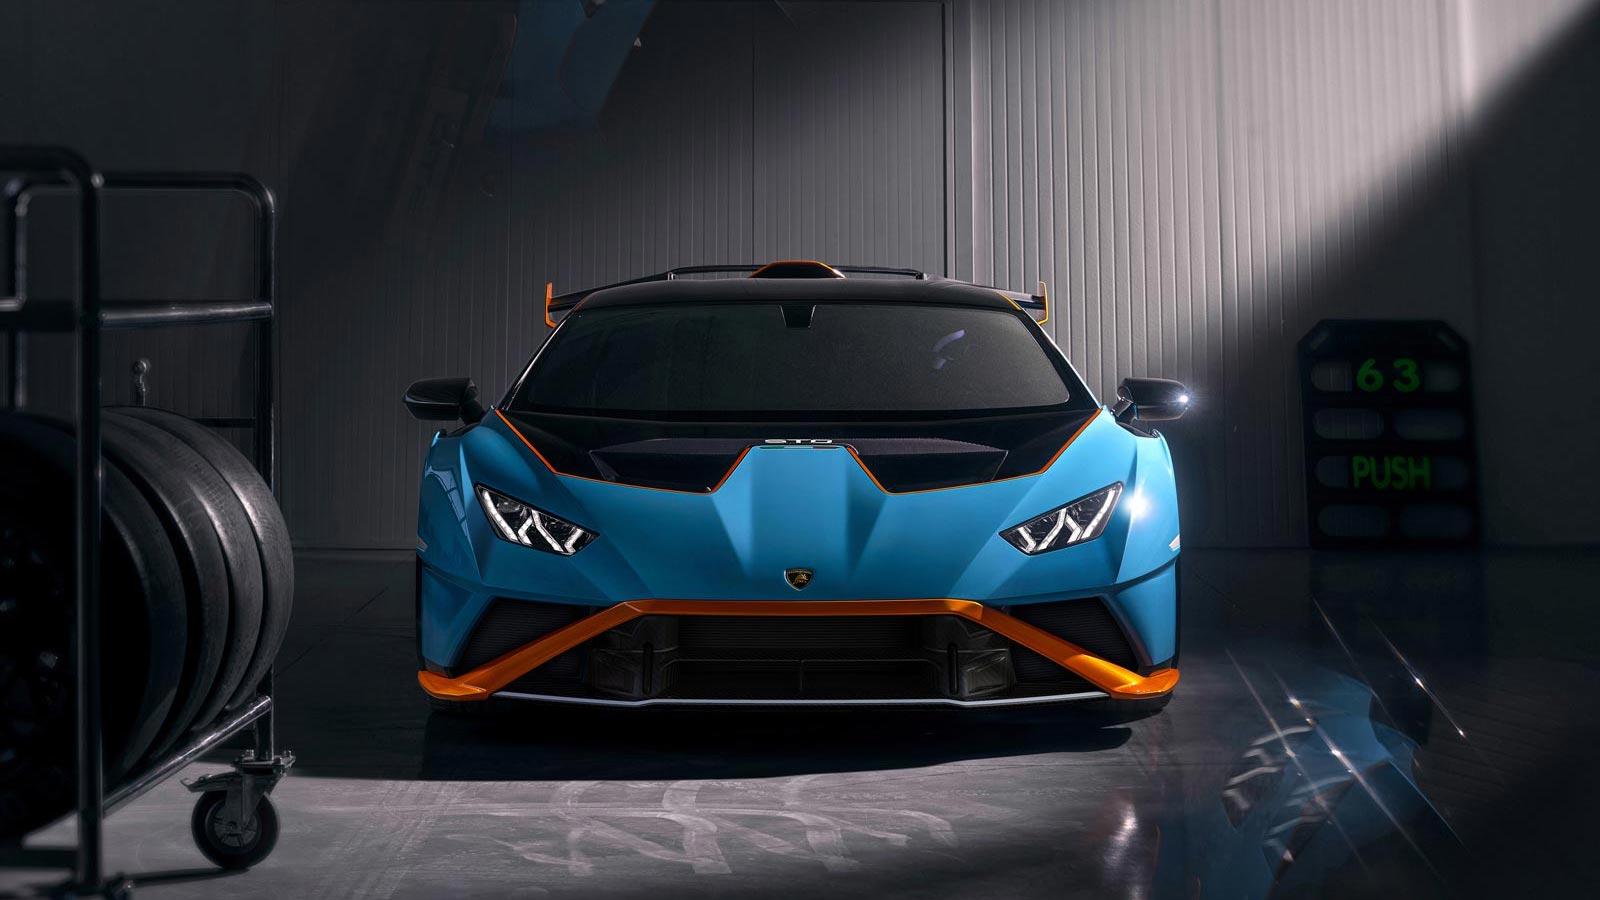 Lamborghini Huracan STO - From racetrack to road image 1